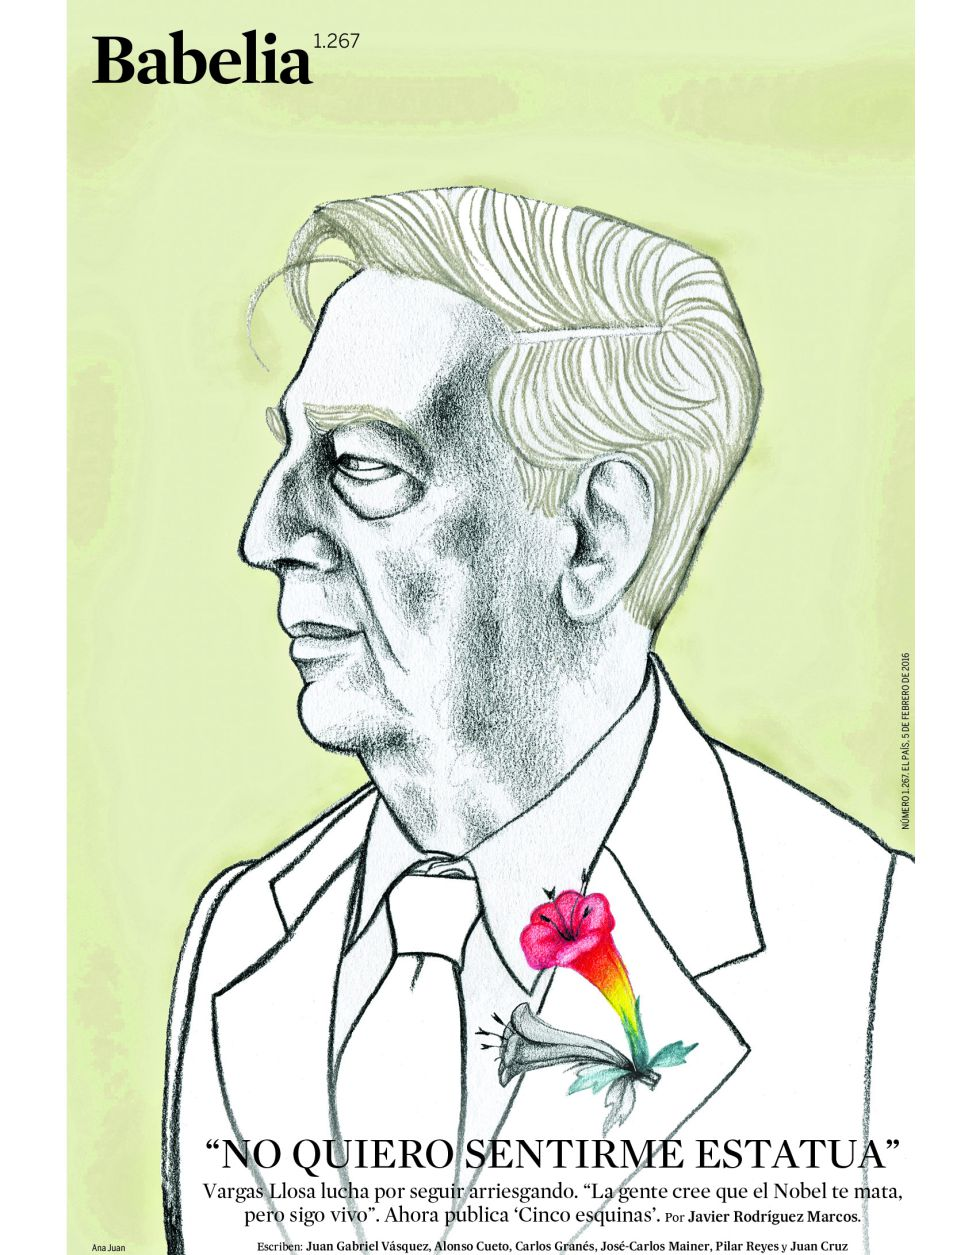 Ilustracíon de Ana Juan.